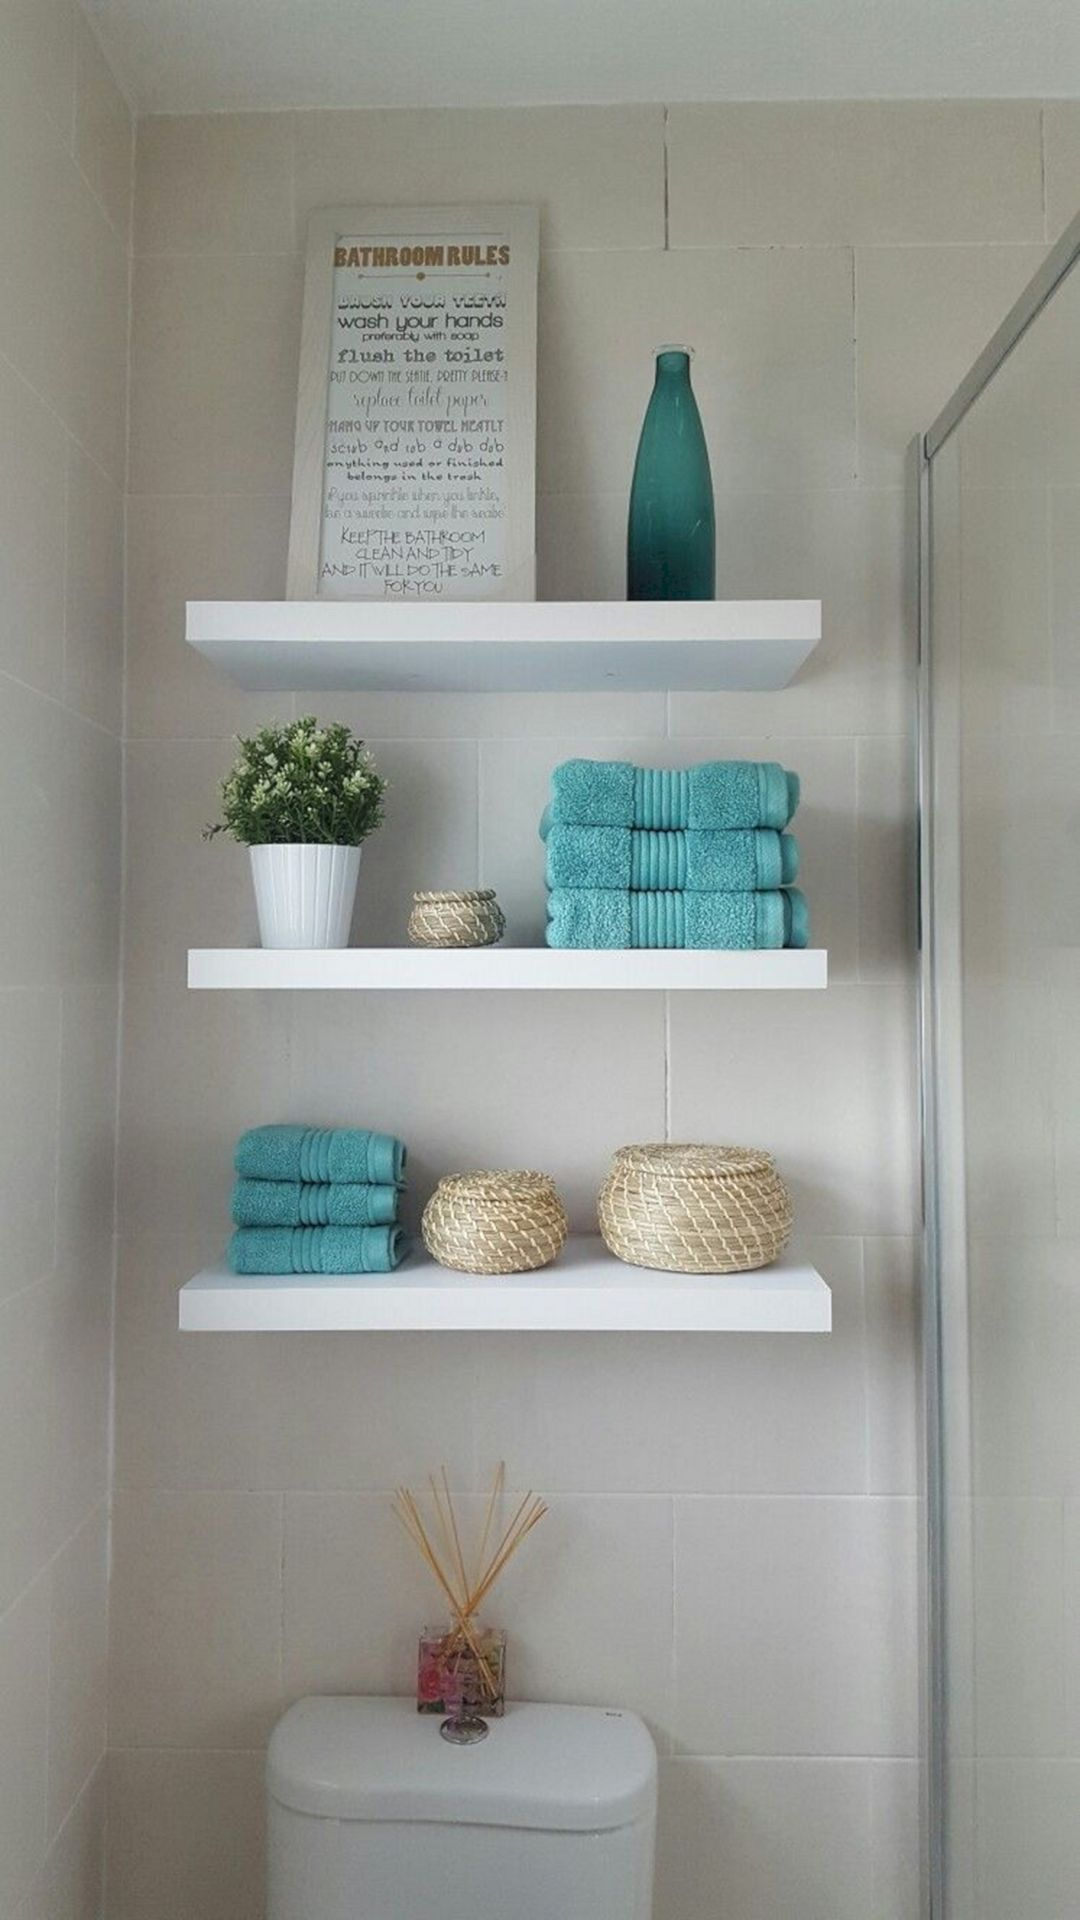 Top 25 Most Popular Creative Bathroom Design For Beautiful Bathroom Ideas Https Decored Diy Bathroom Storage Shelves Over Toilet Bathroom Shelves Over Toilet